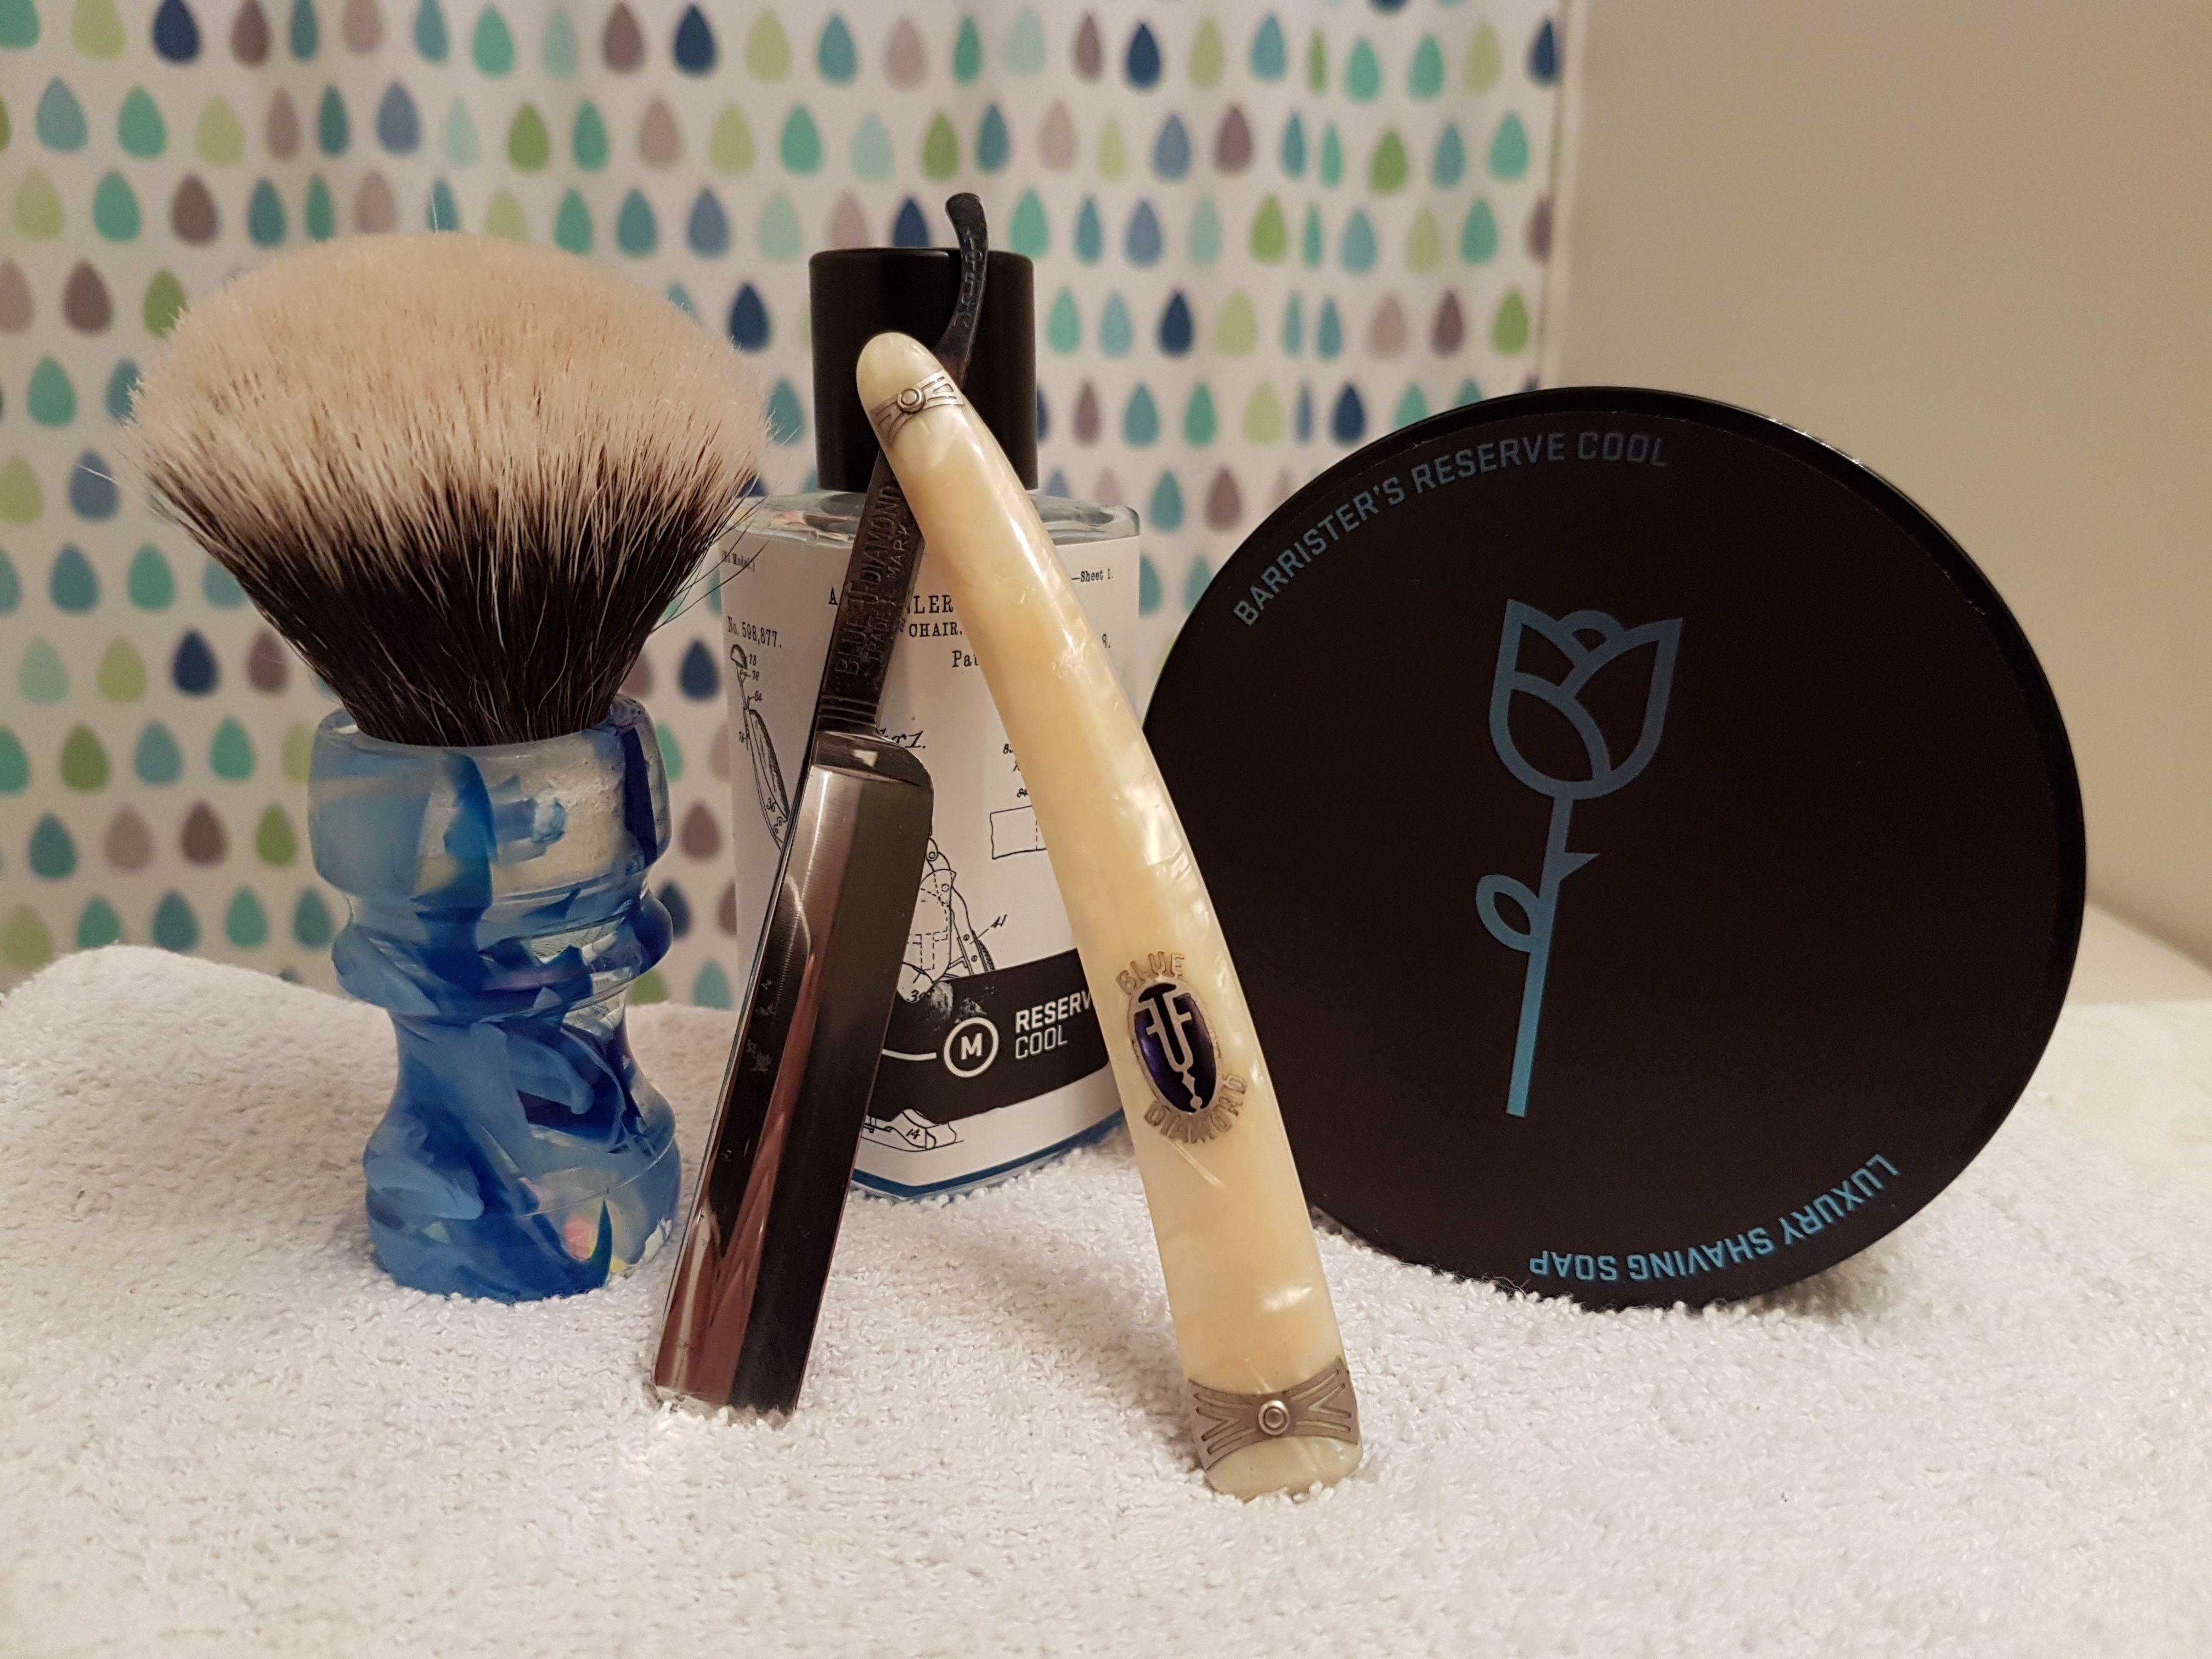 /u/Quadricwan Soap Reserve Cool Brush Declaration Custom